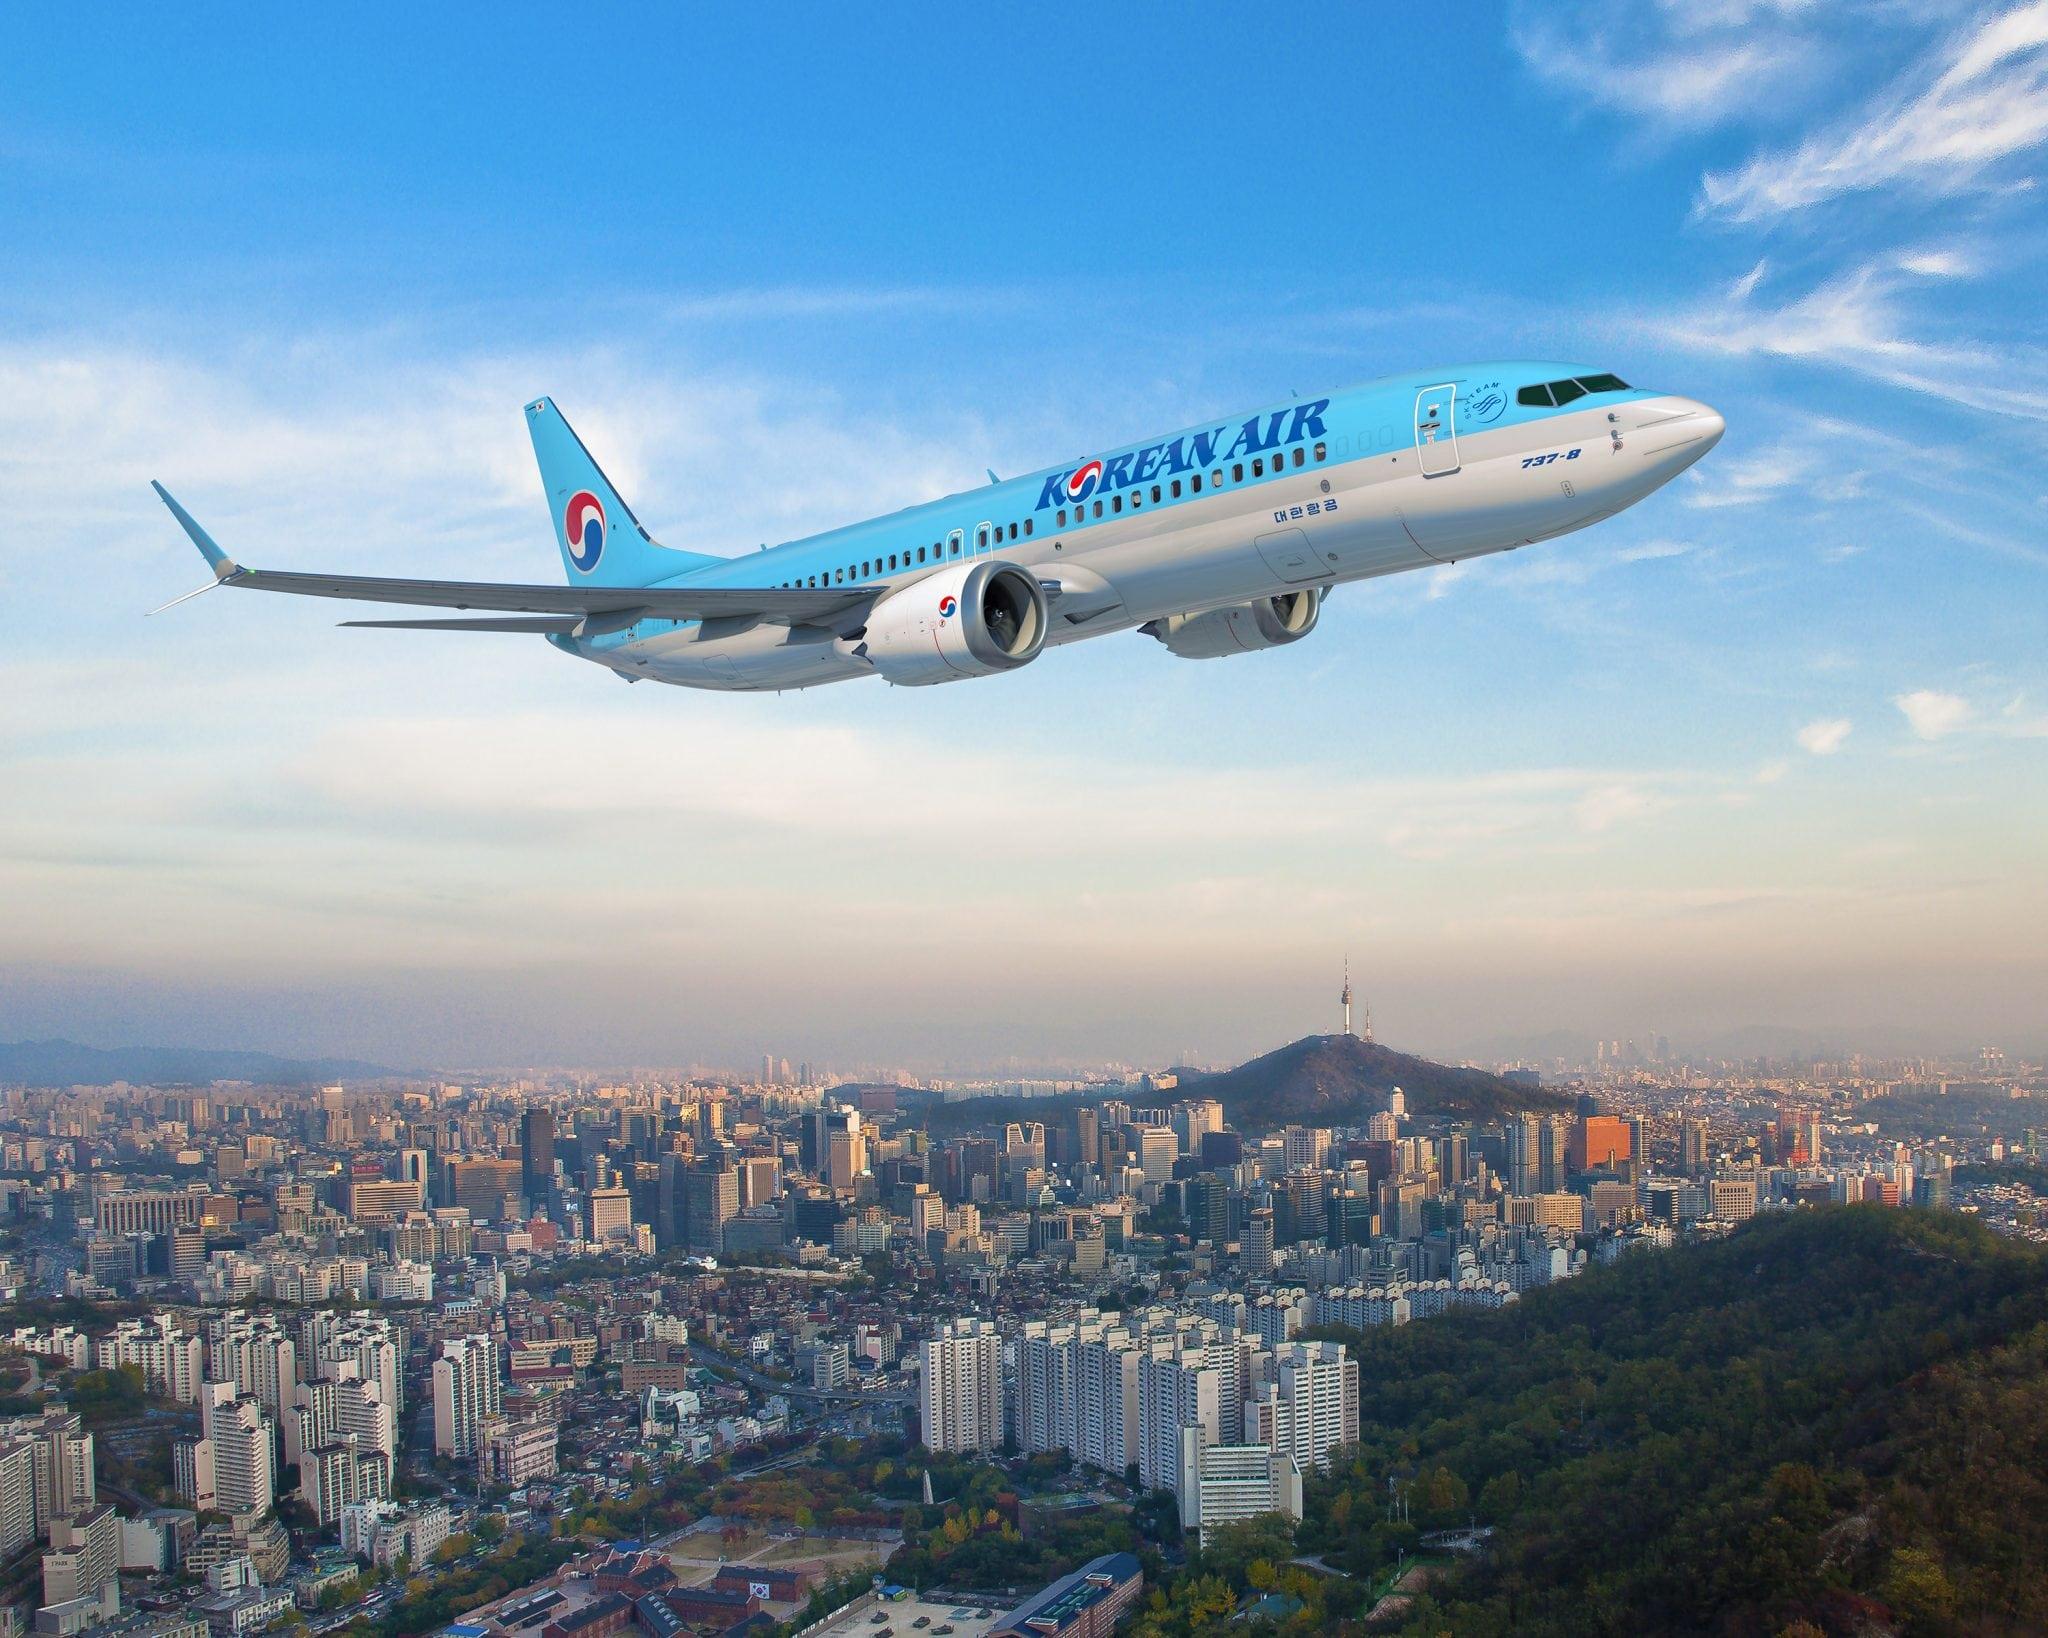 Boeing has confirmed Korean Air's $4 billion fleet upgrade.